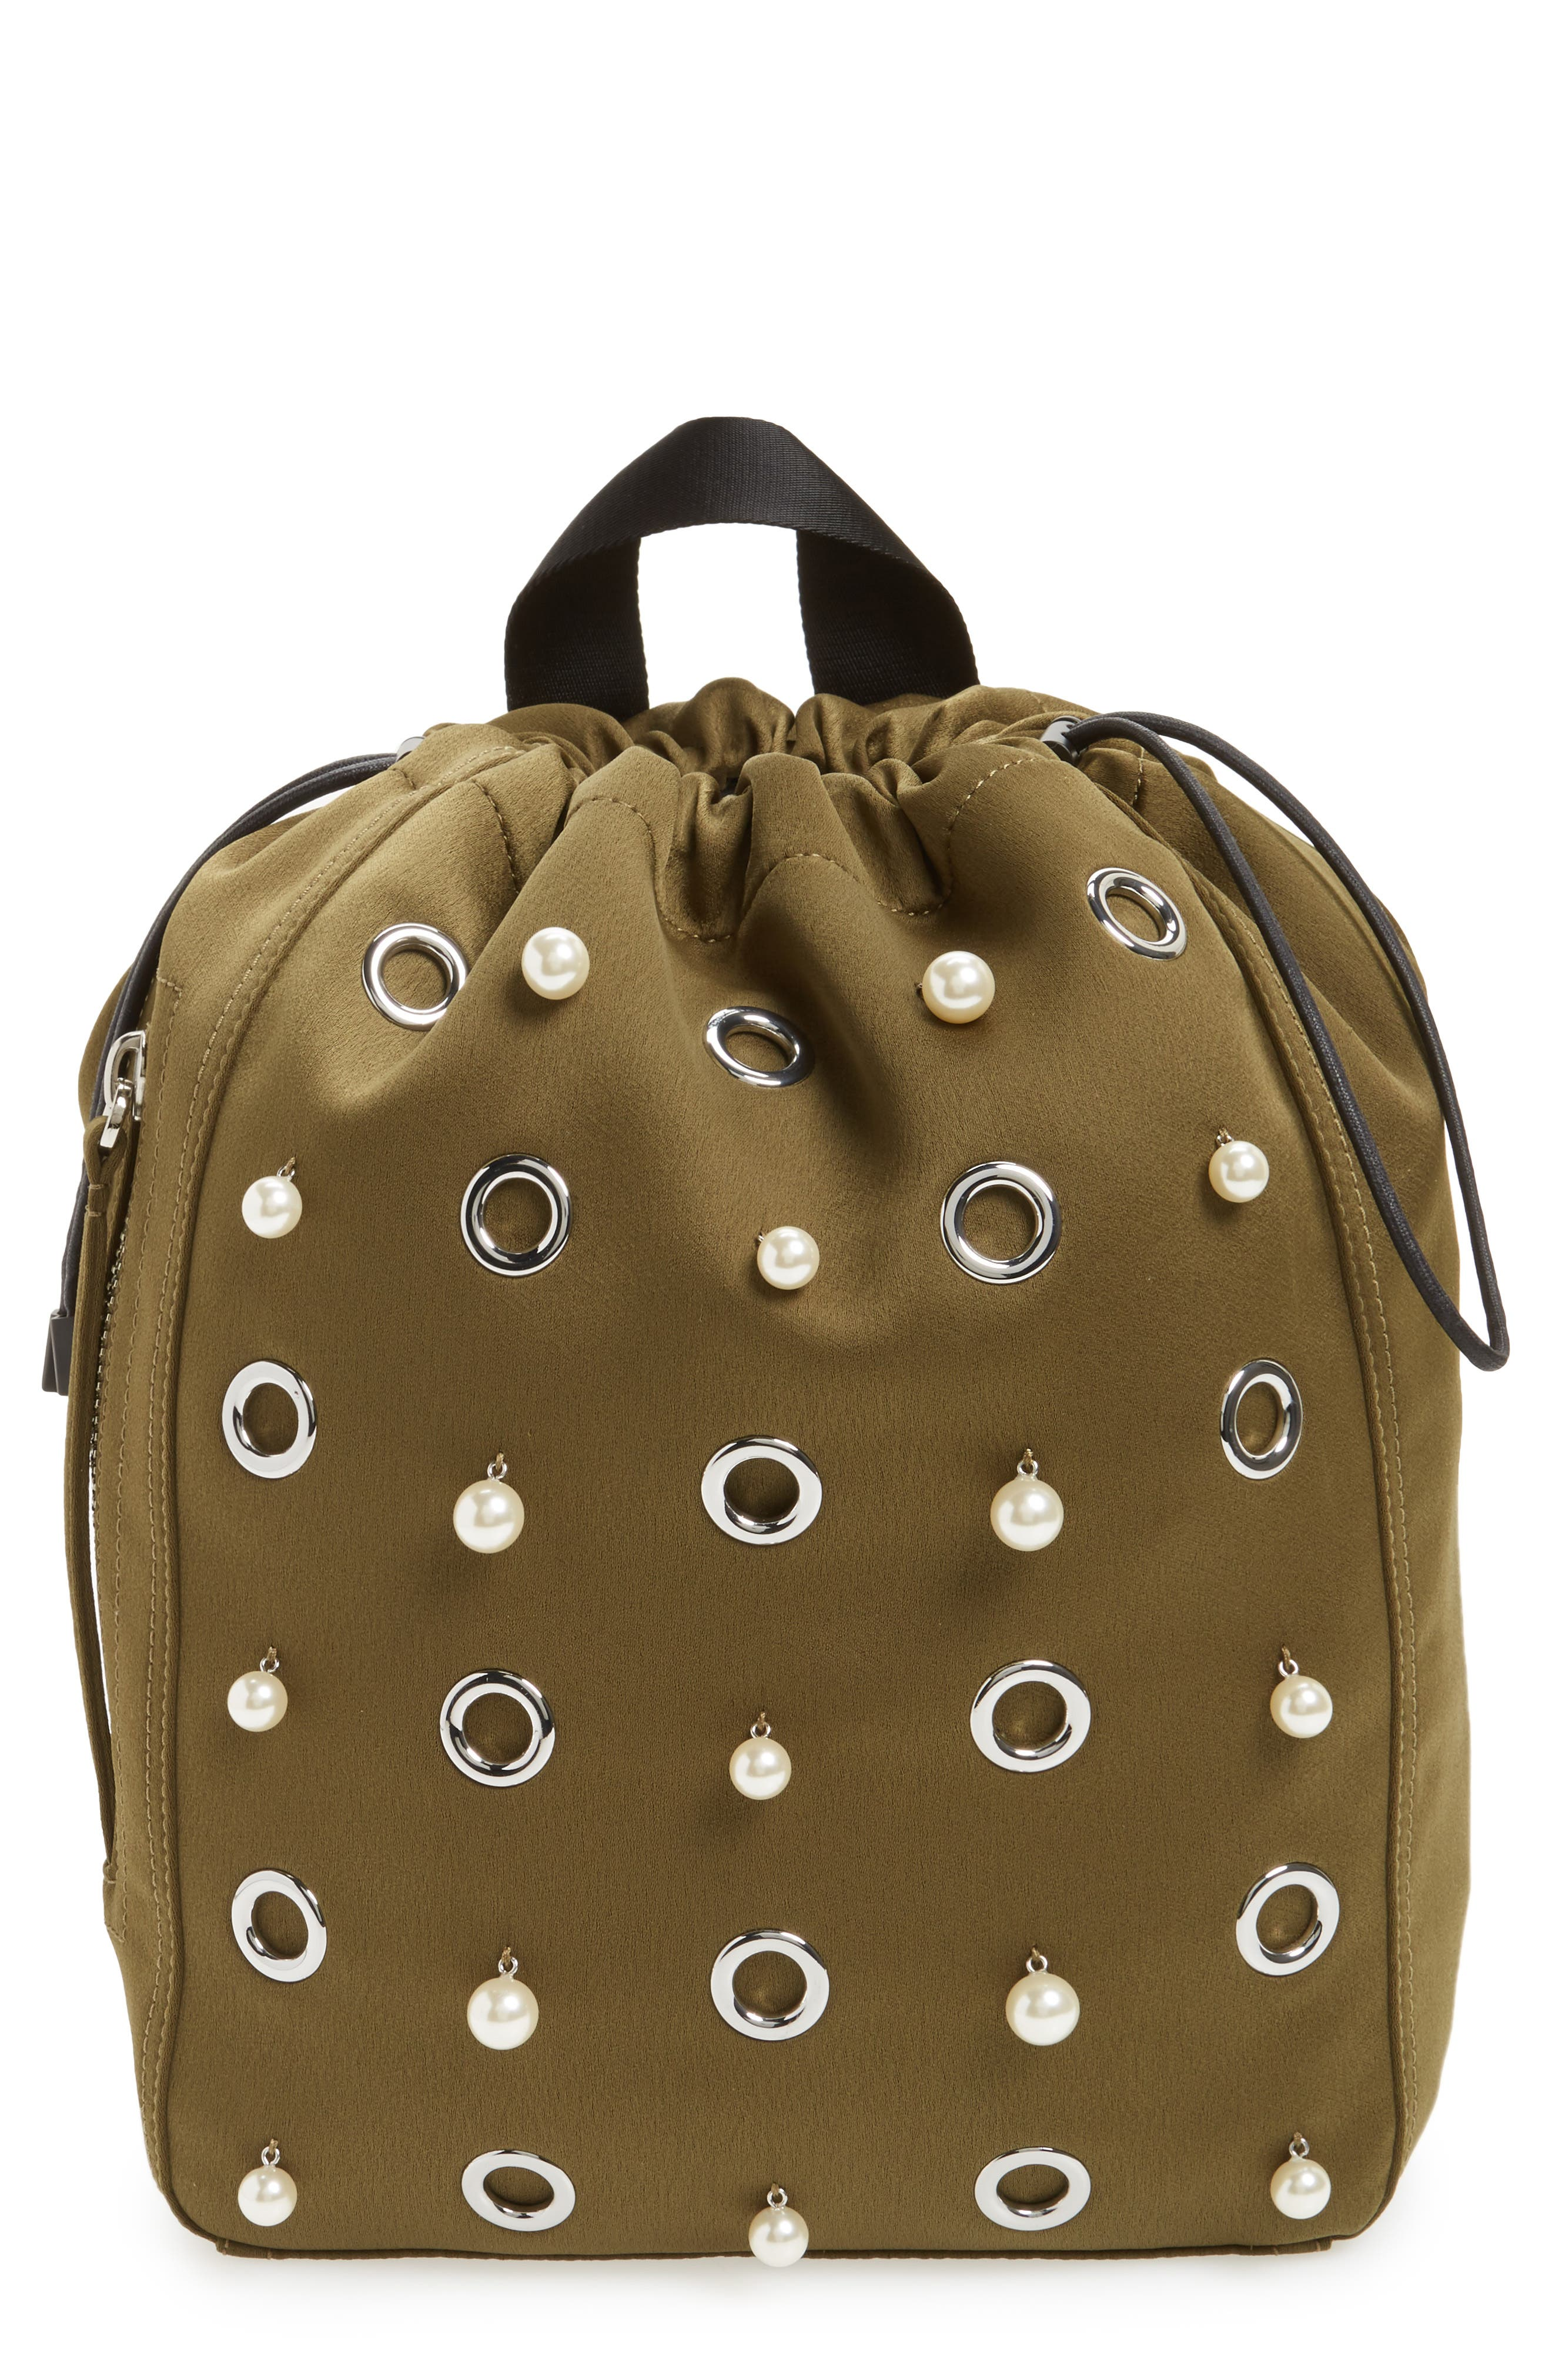 Phillip Lim 3.1 Medium Go-Go Embellished Backpack,                             Main thumbnail 1, color,